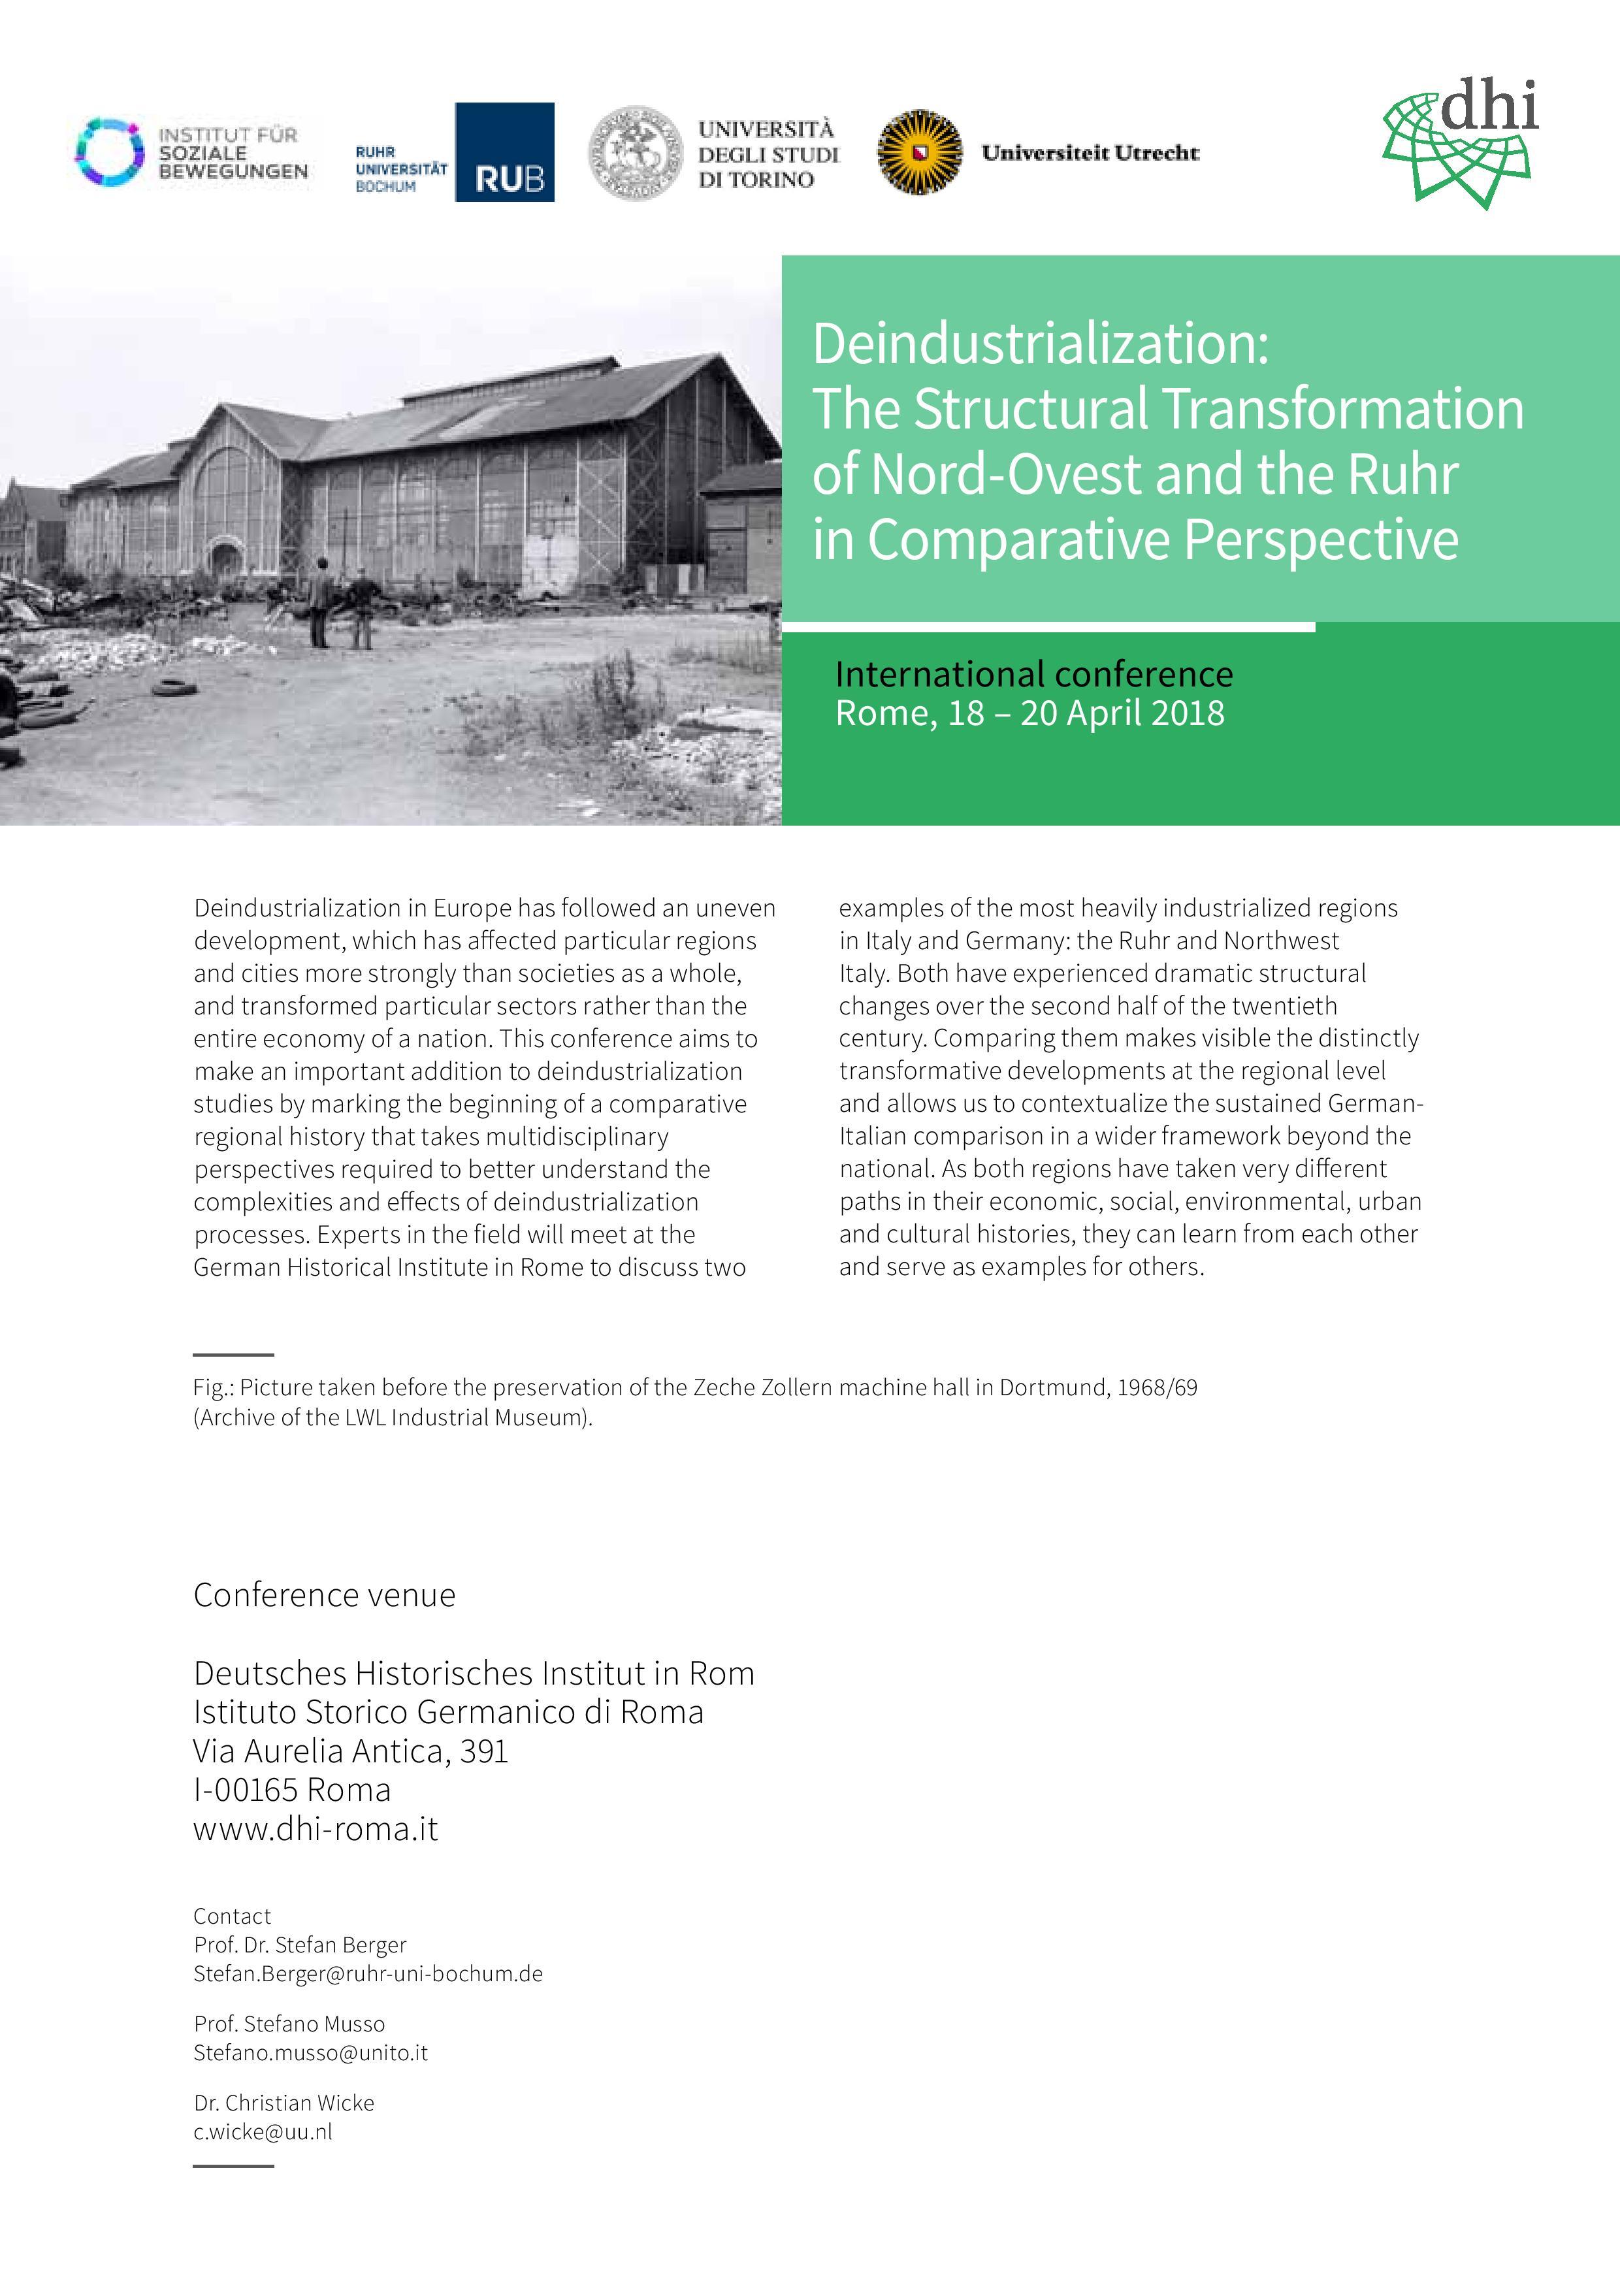 Deindustrialization_Programm_Web-page-001